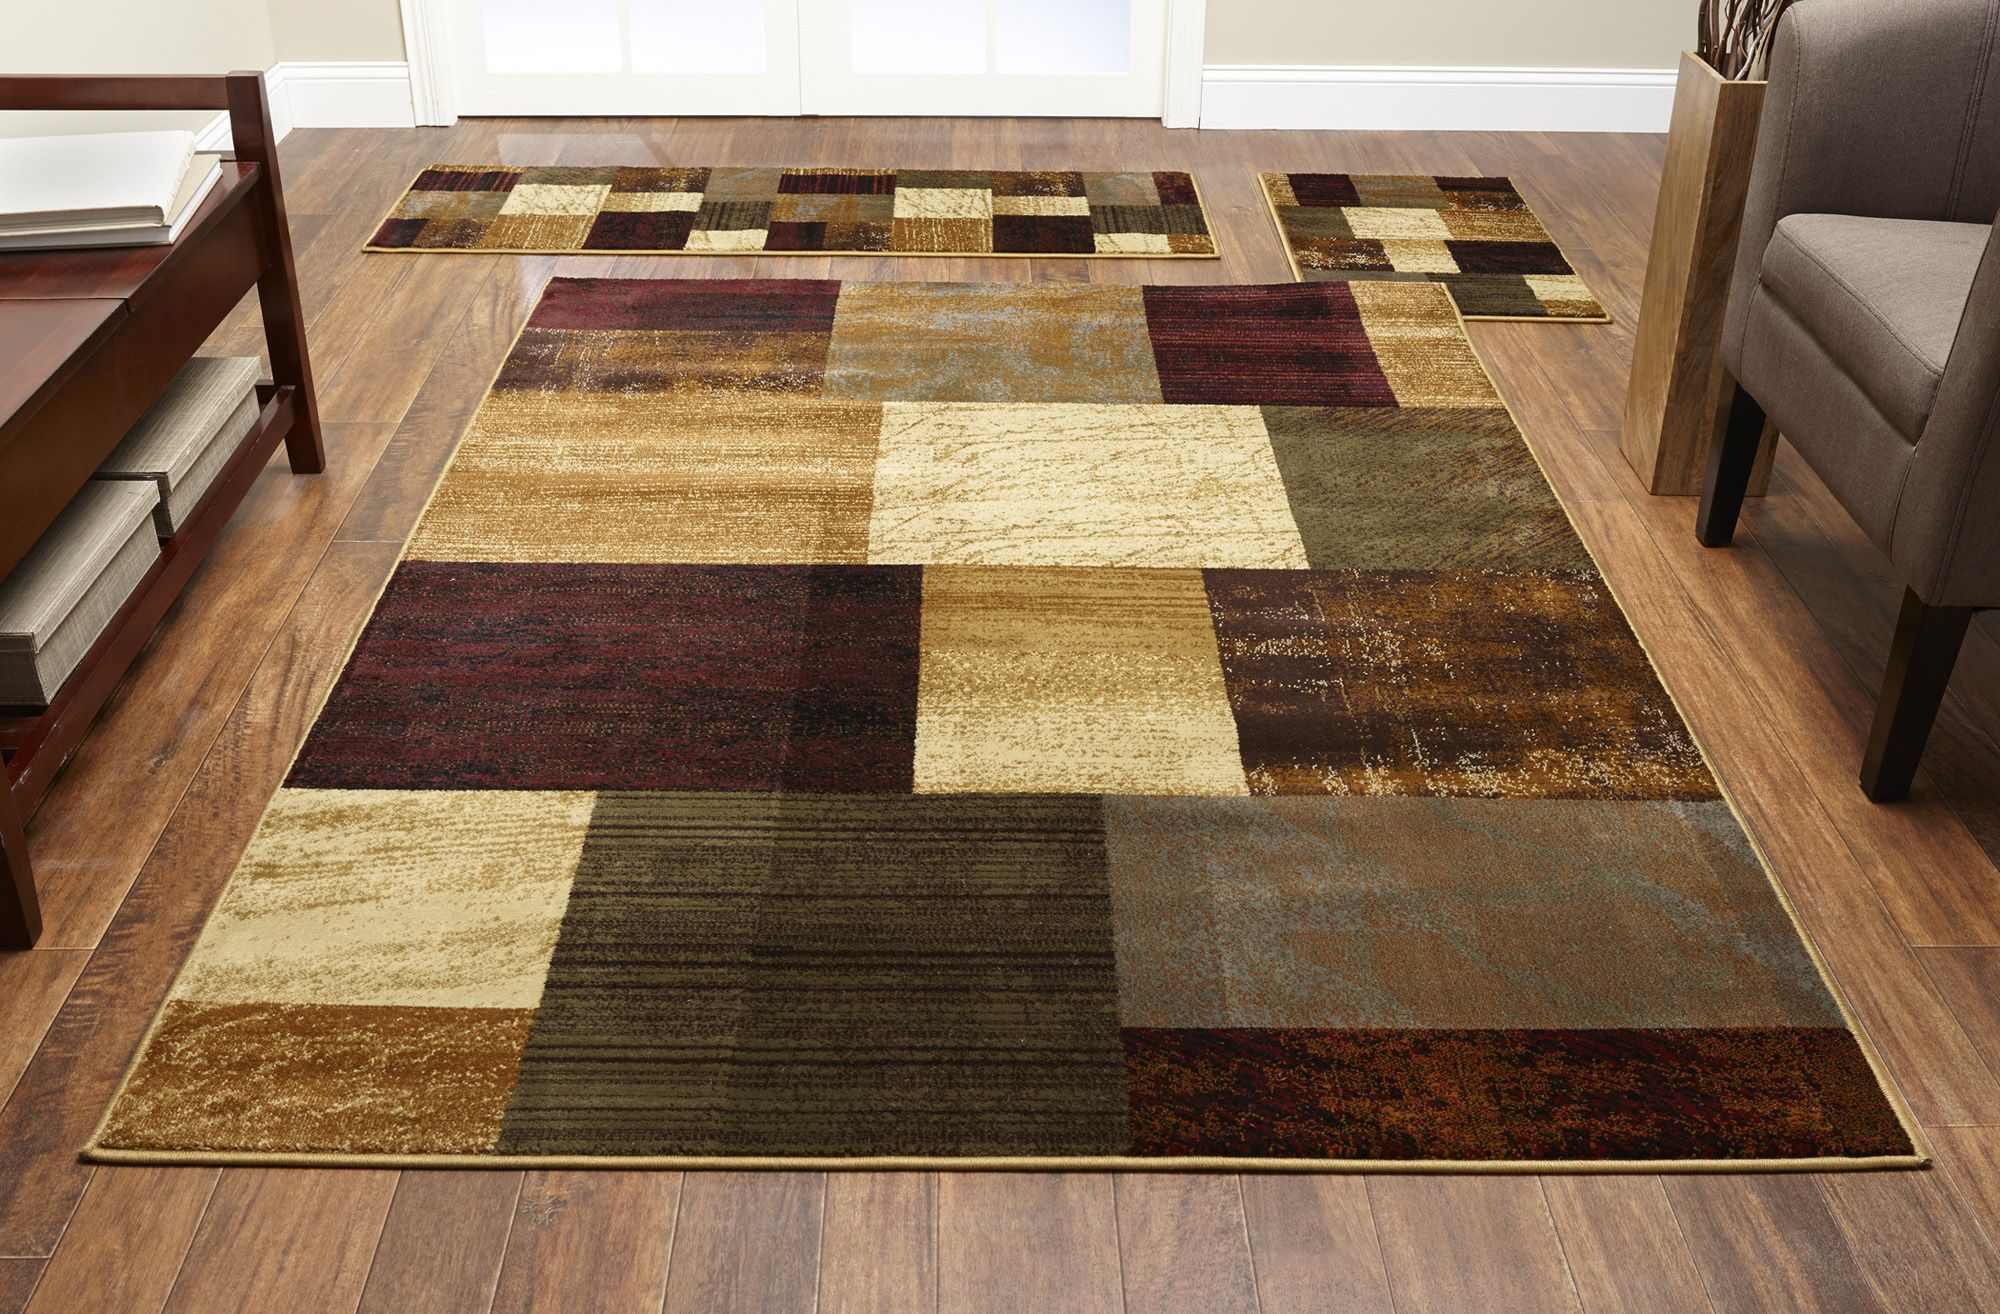 Fingerhut mcleland design brodie 3 pc area rug set